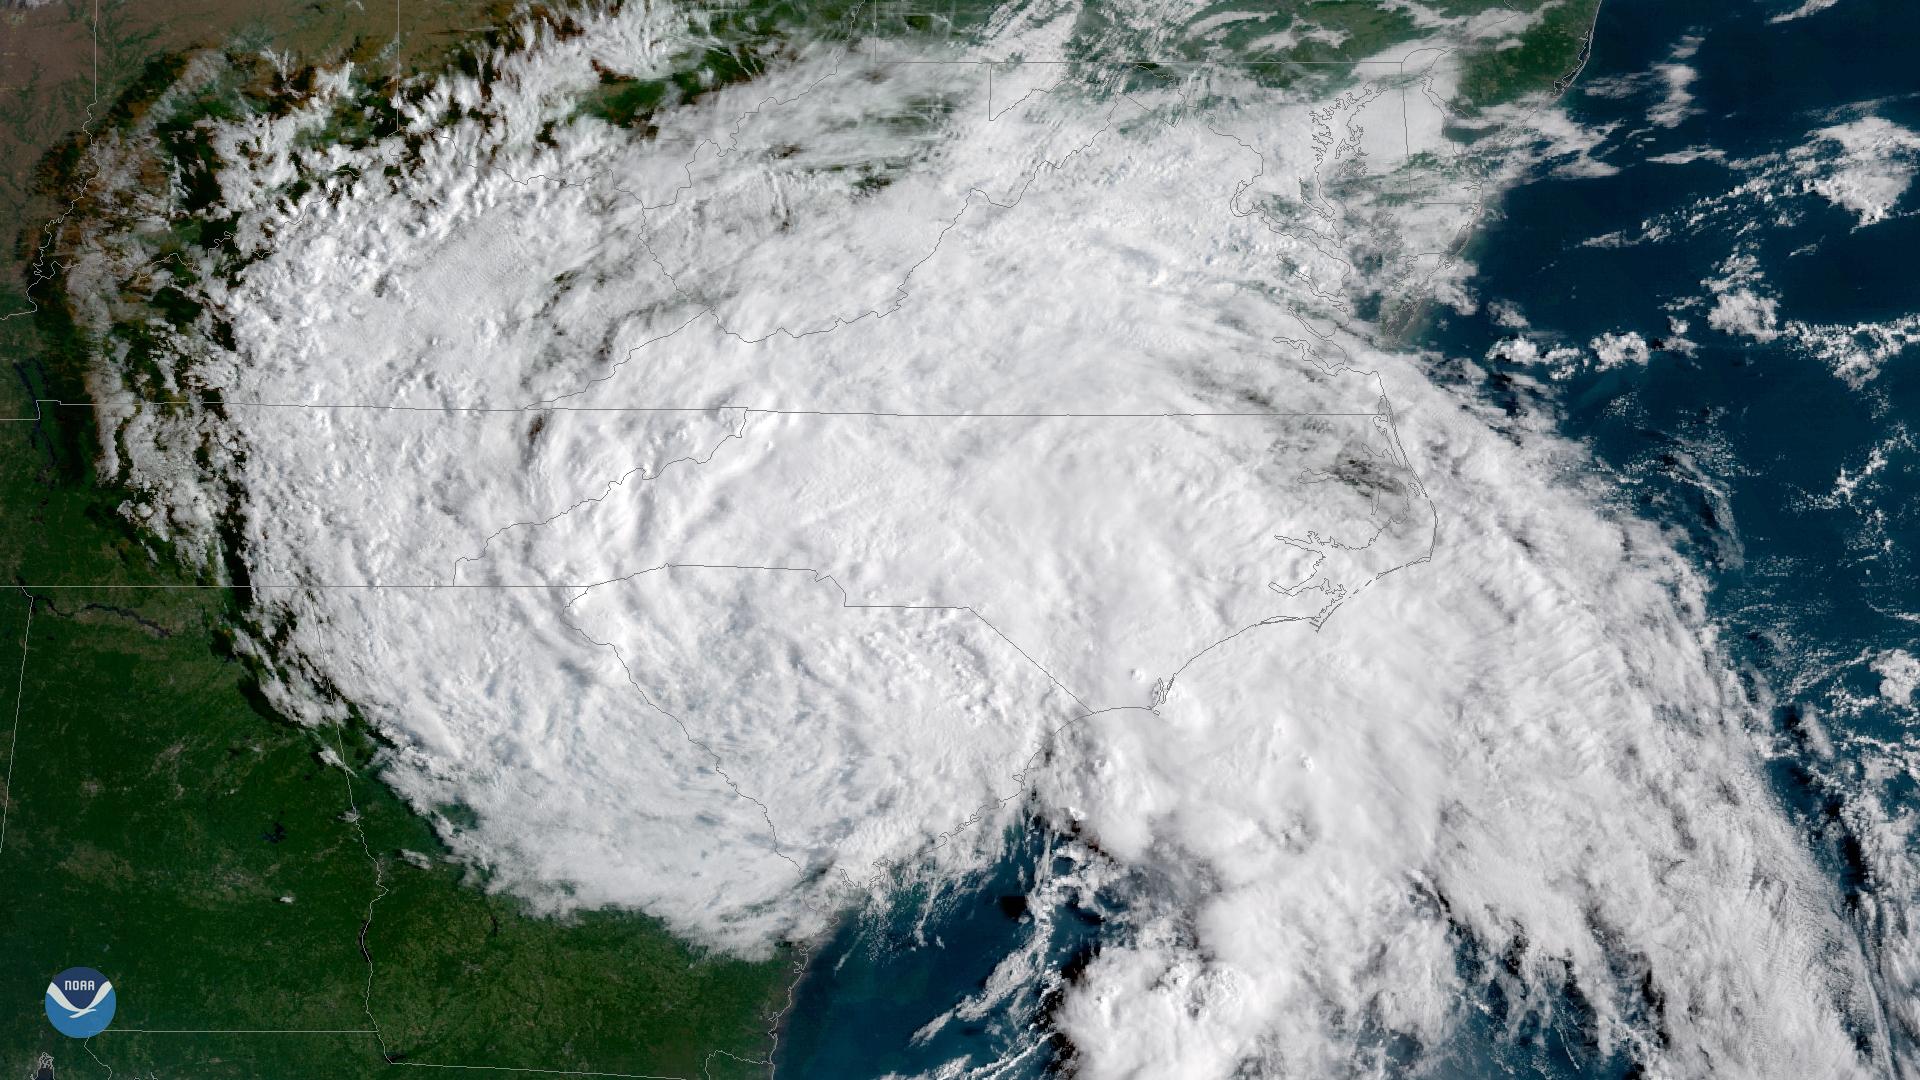 fiercepharma.com - Pfizer, Glaxo, Novo, Novartis plants unfazed by hurricane, resume production, Merck not as lucky